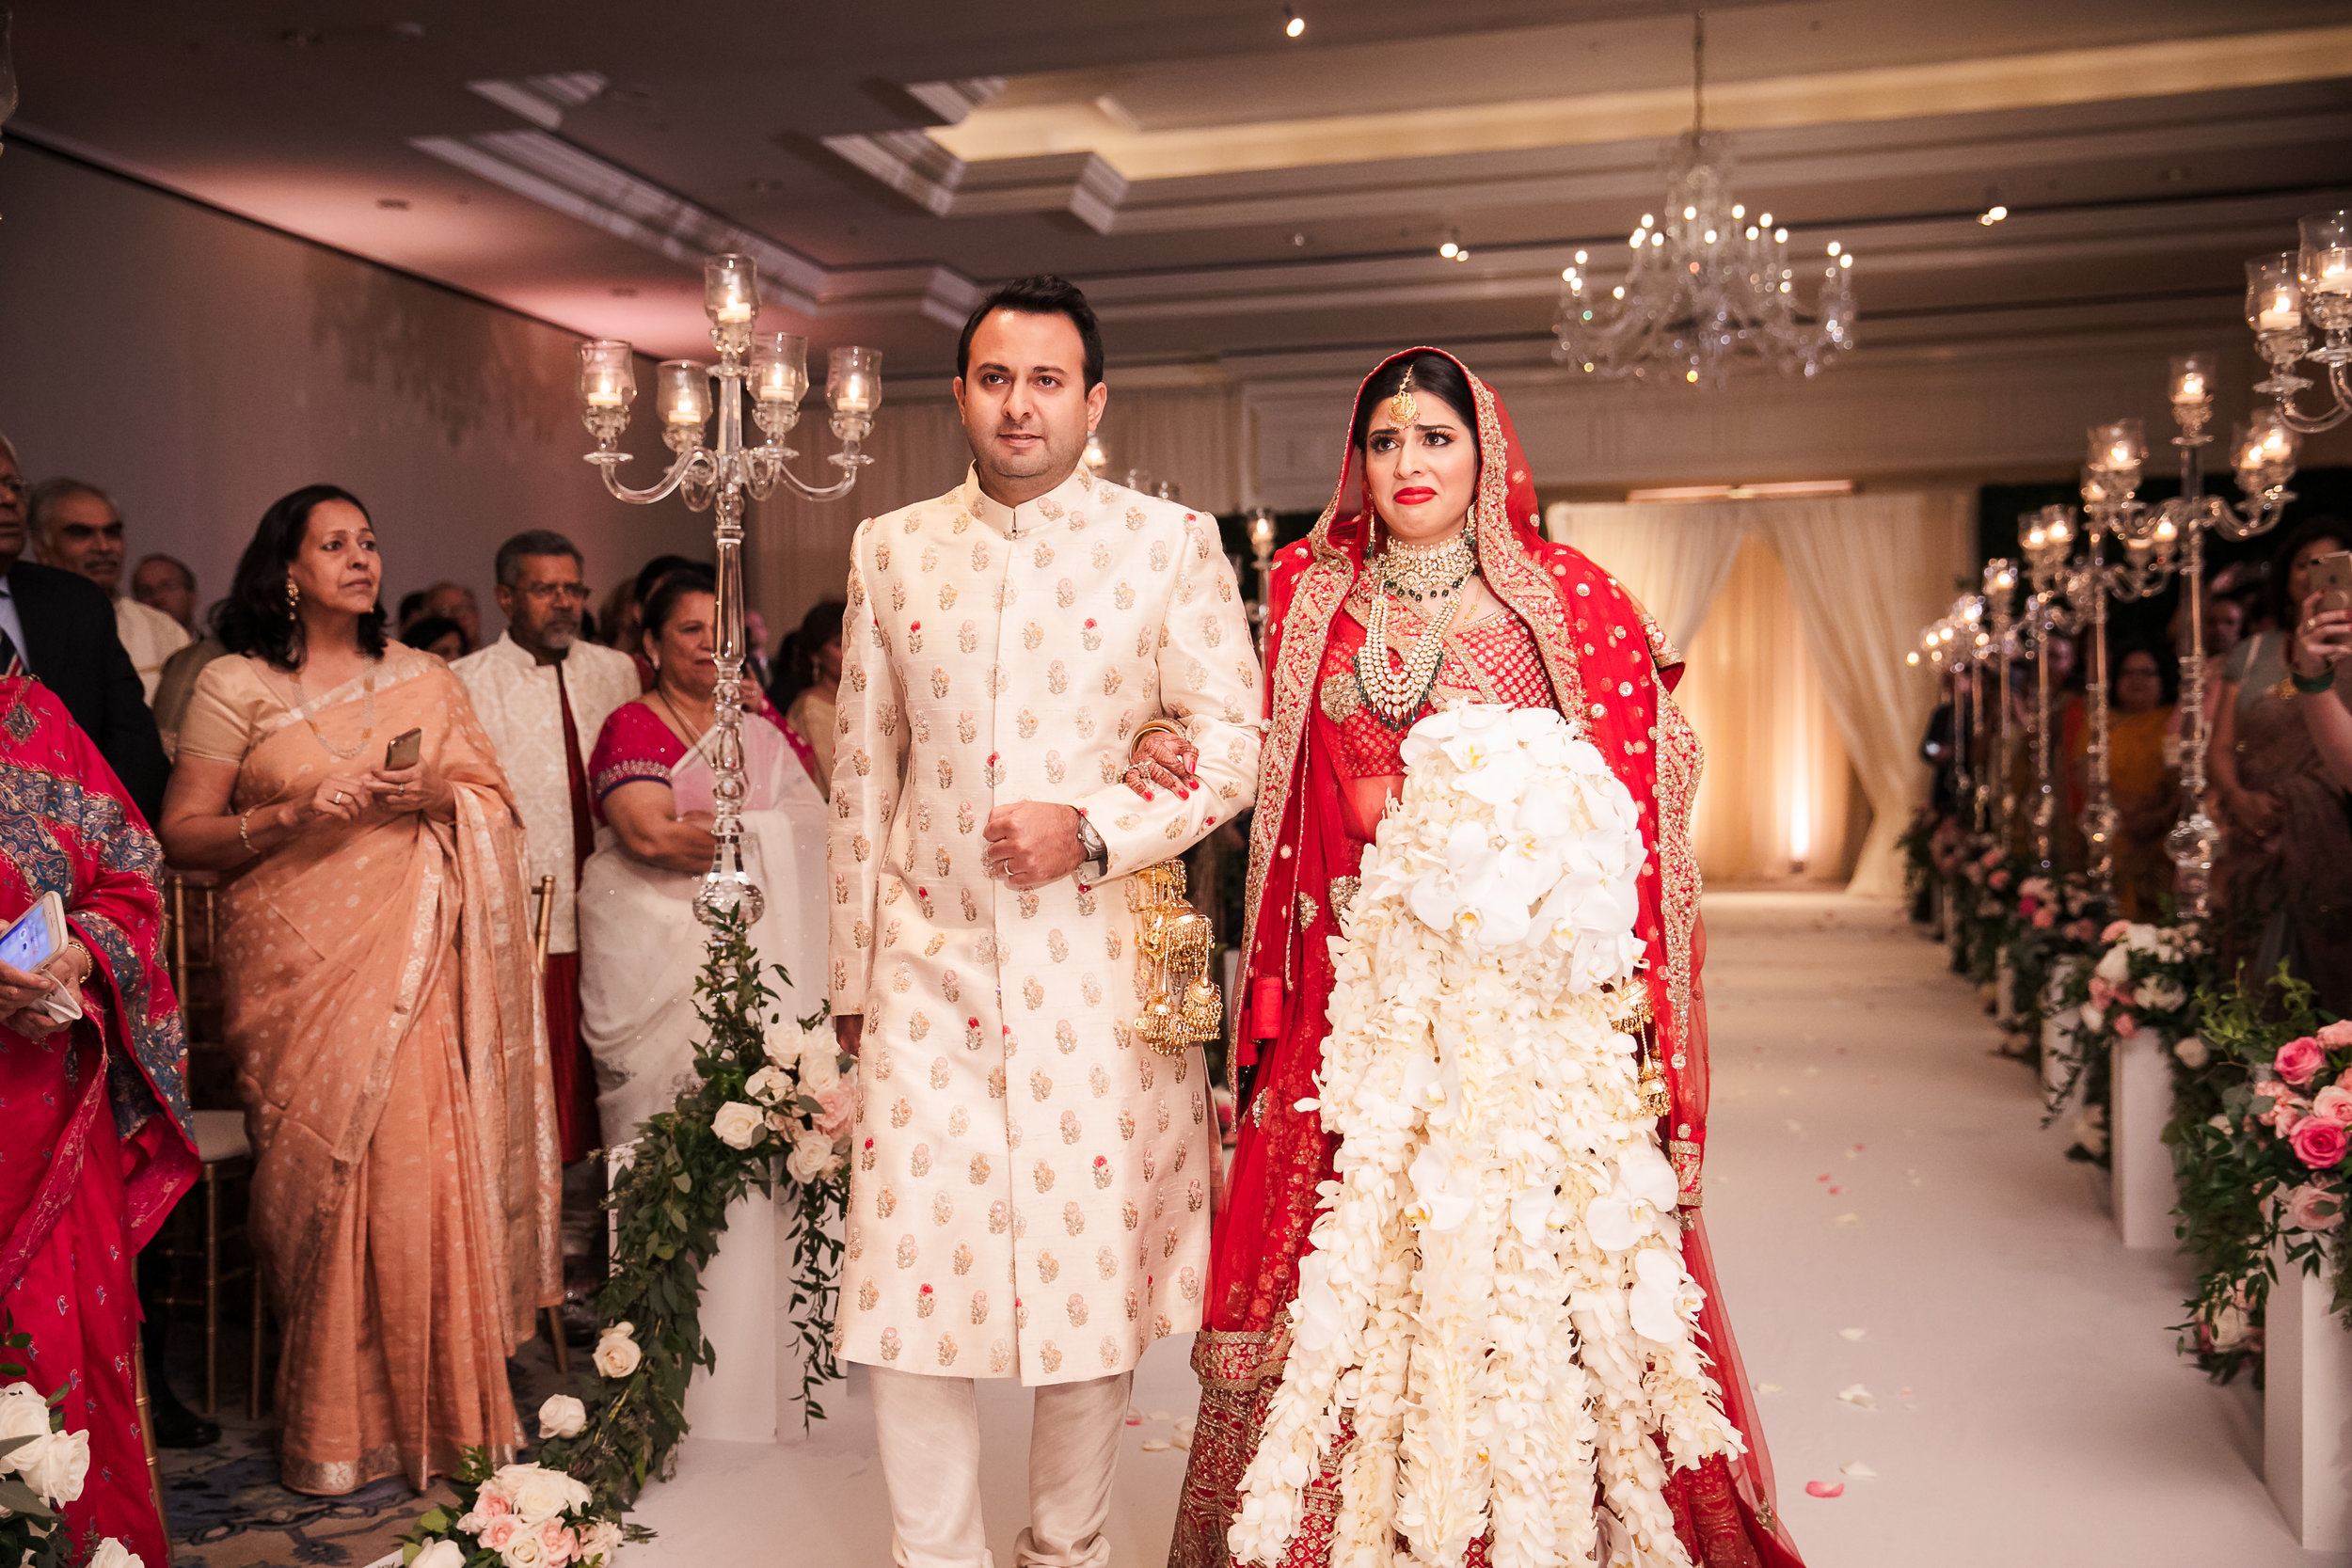 INDIAN WEDDING CEREMONY AISLE.jpg